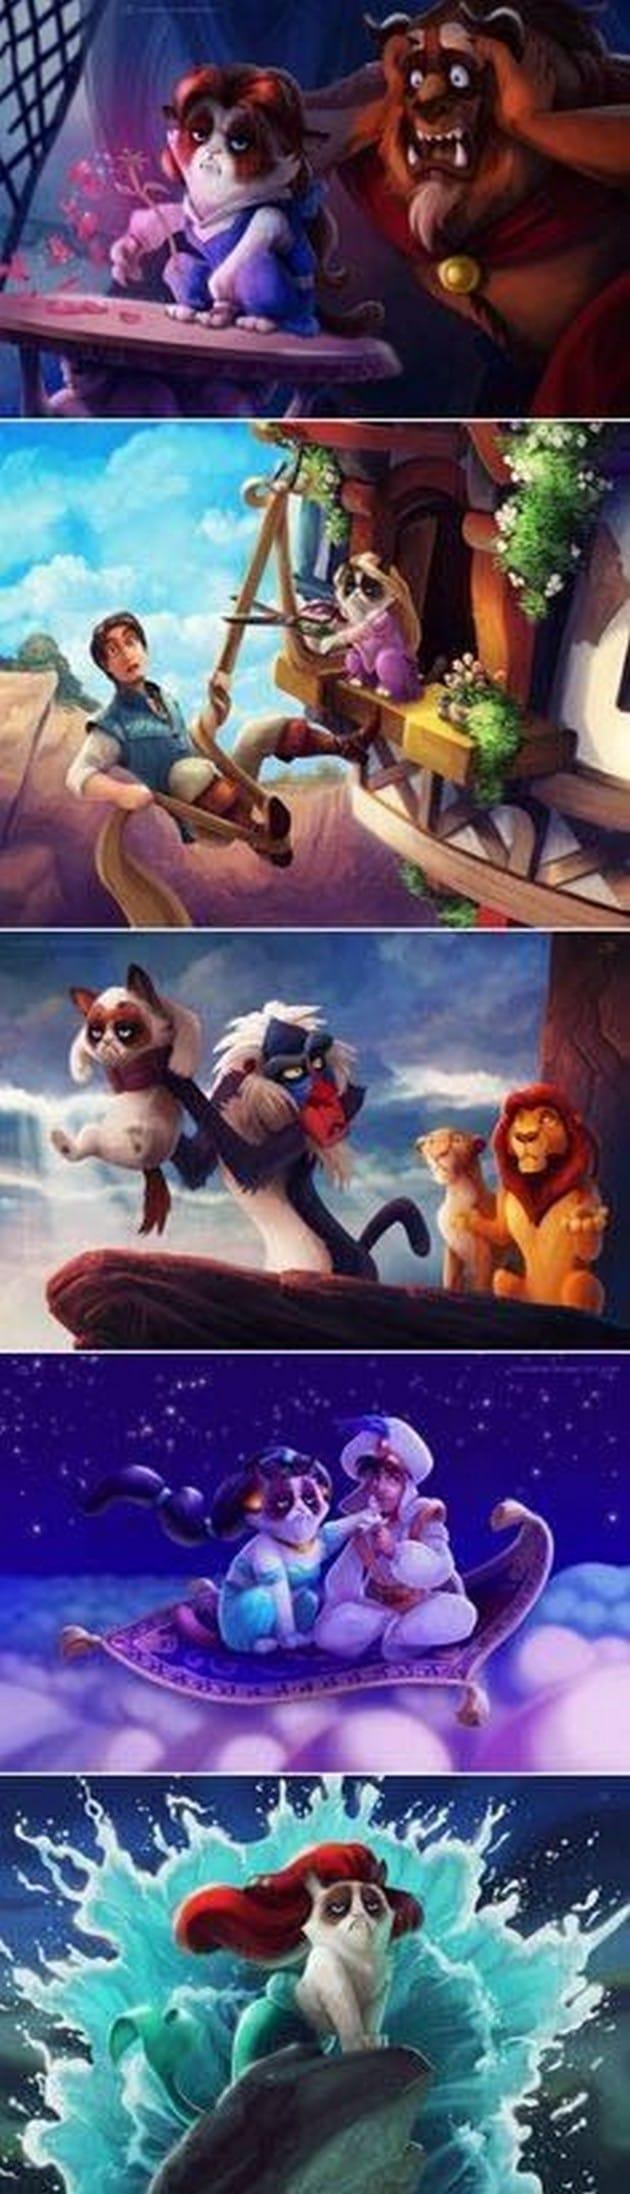 tales-of-the-grumpy-cat